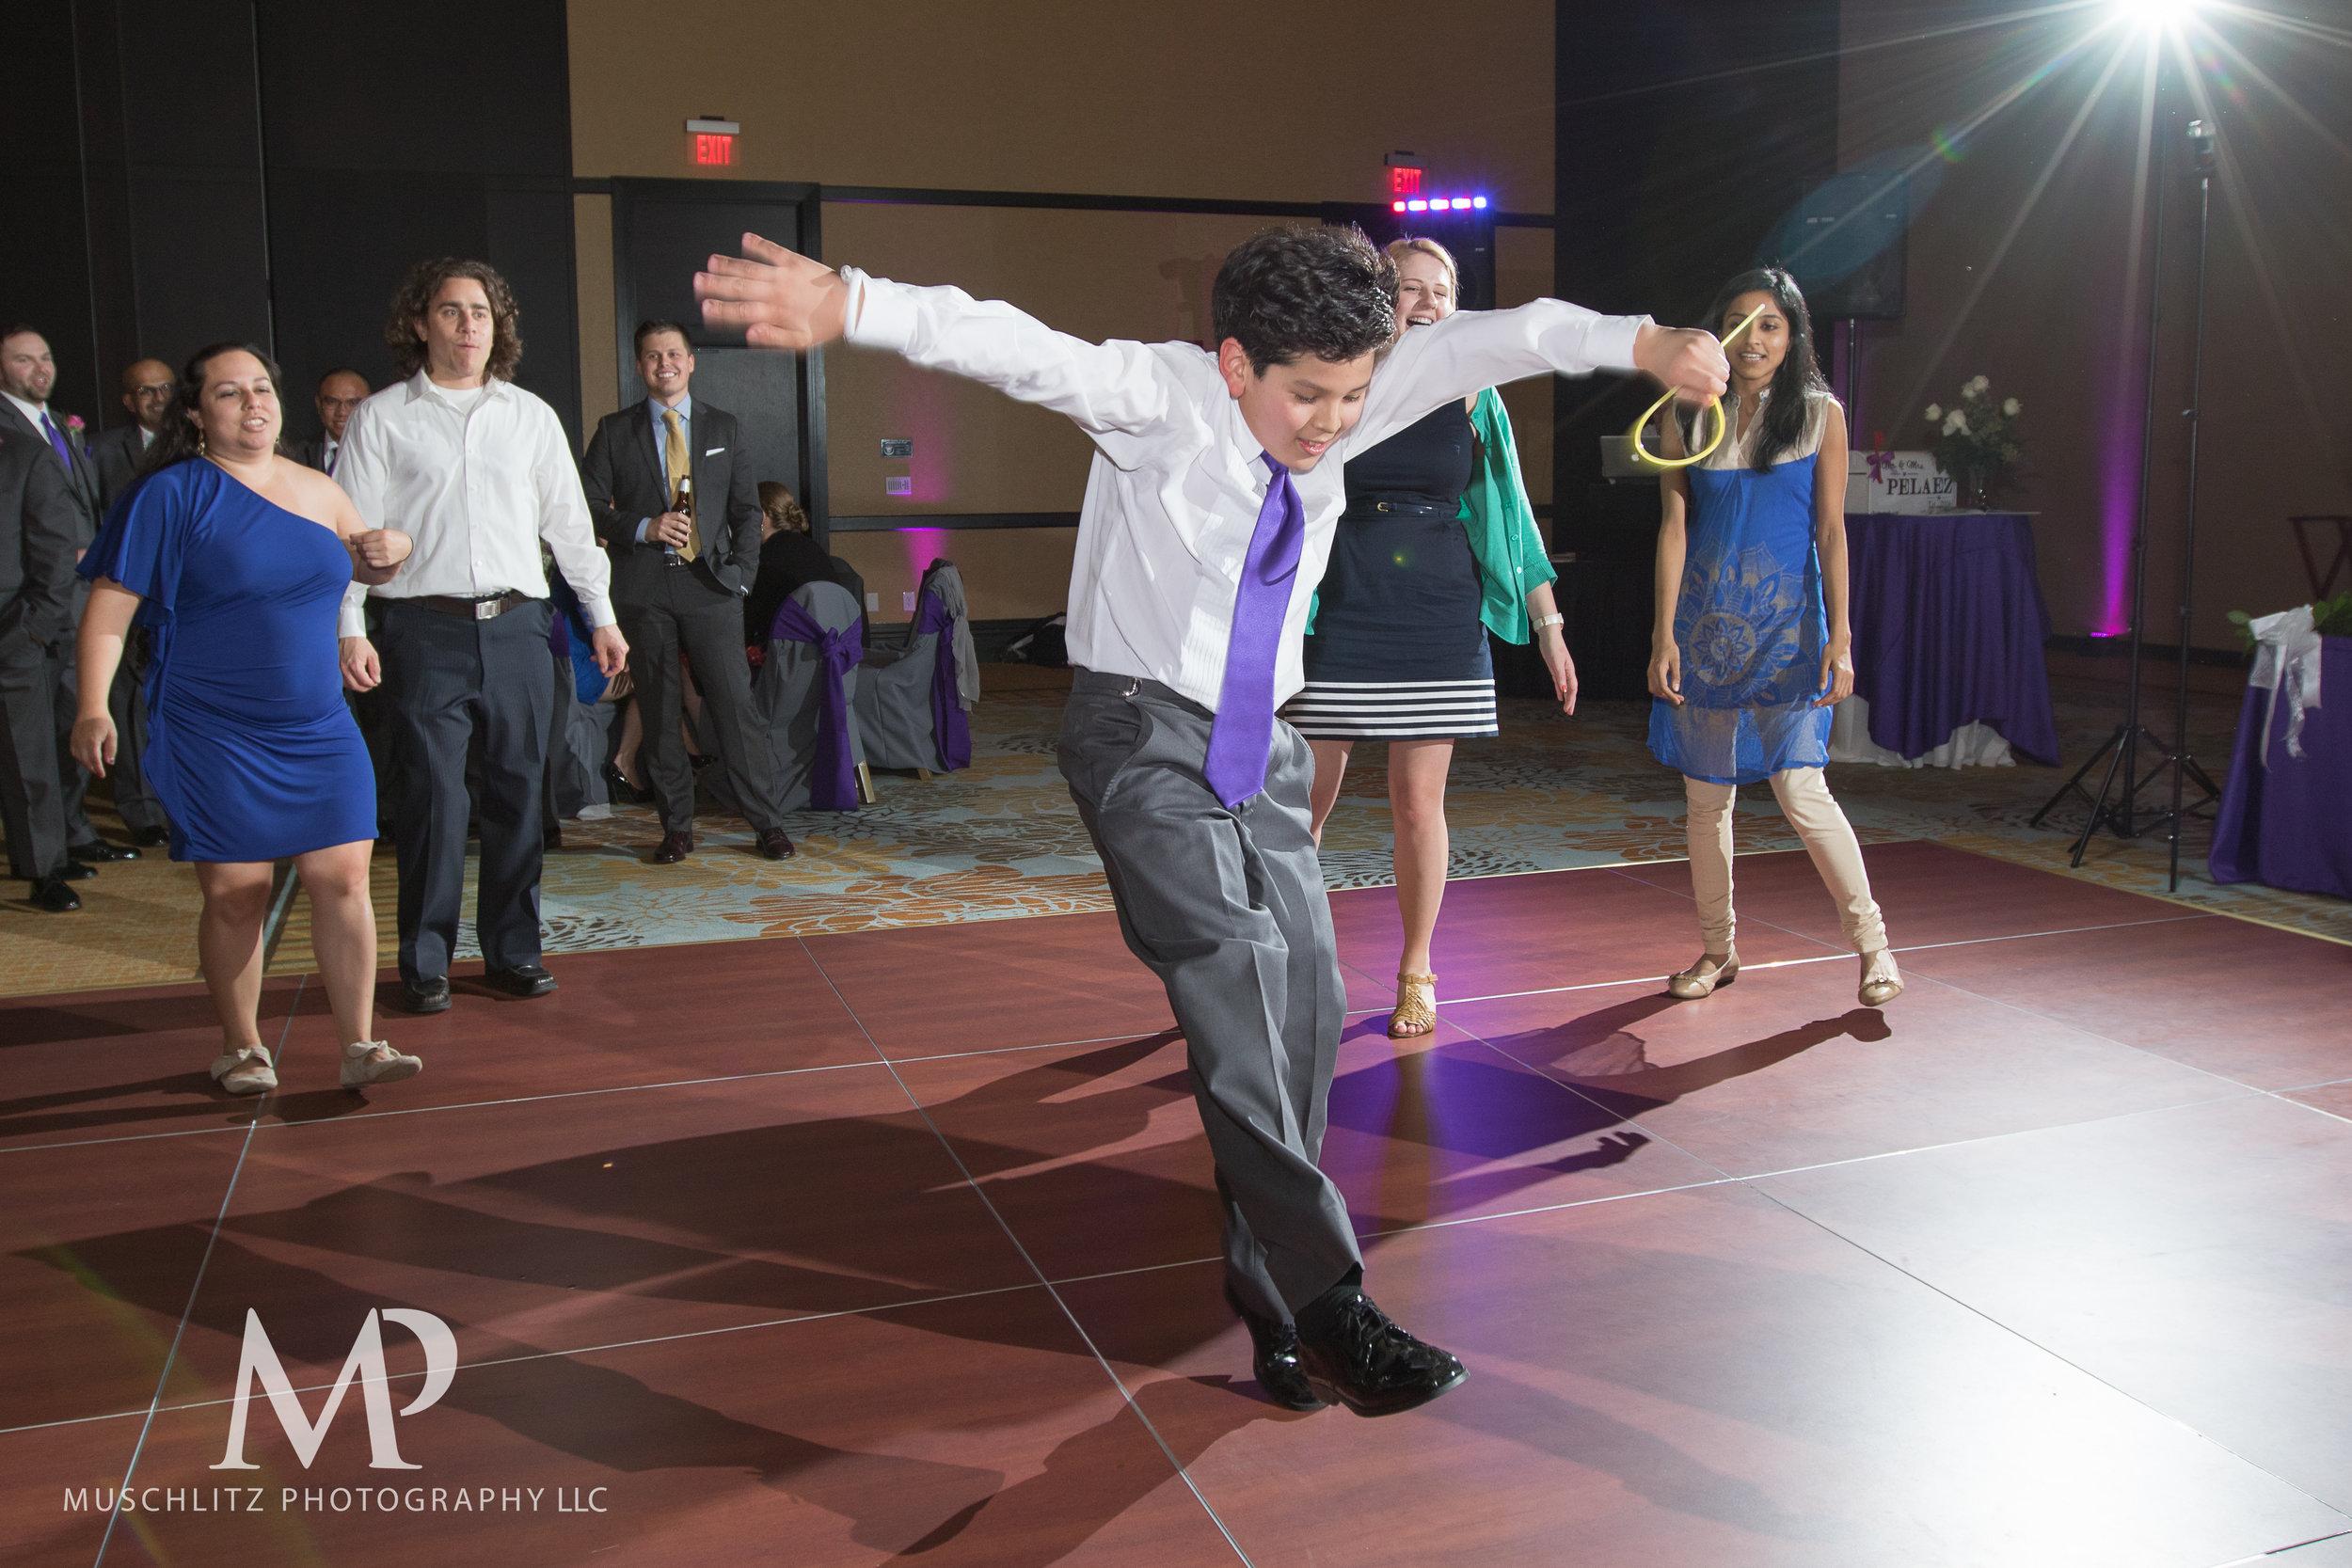 hilton-polaris-wedding-columbus-ohio-muschlitz-photography-080.JPG